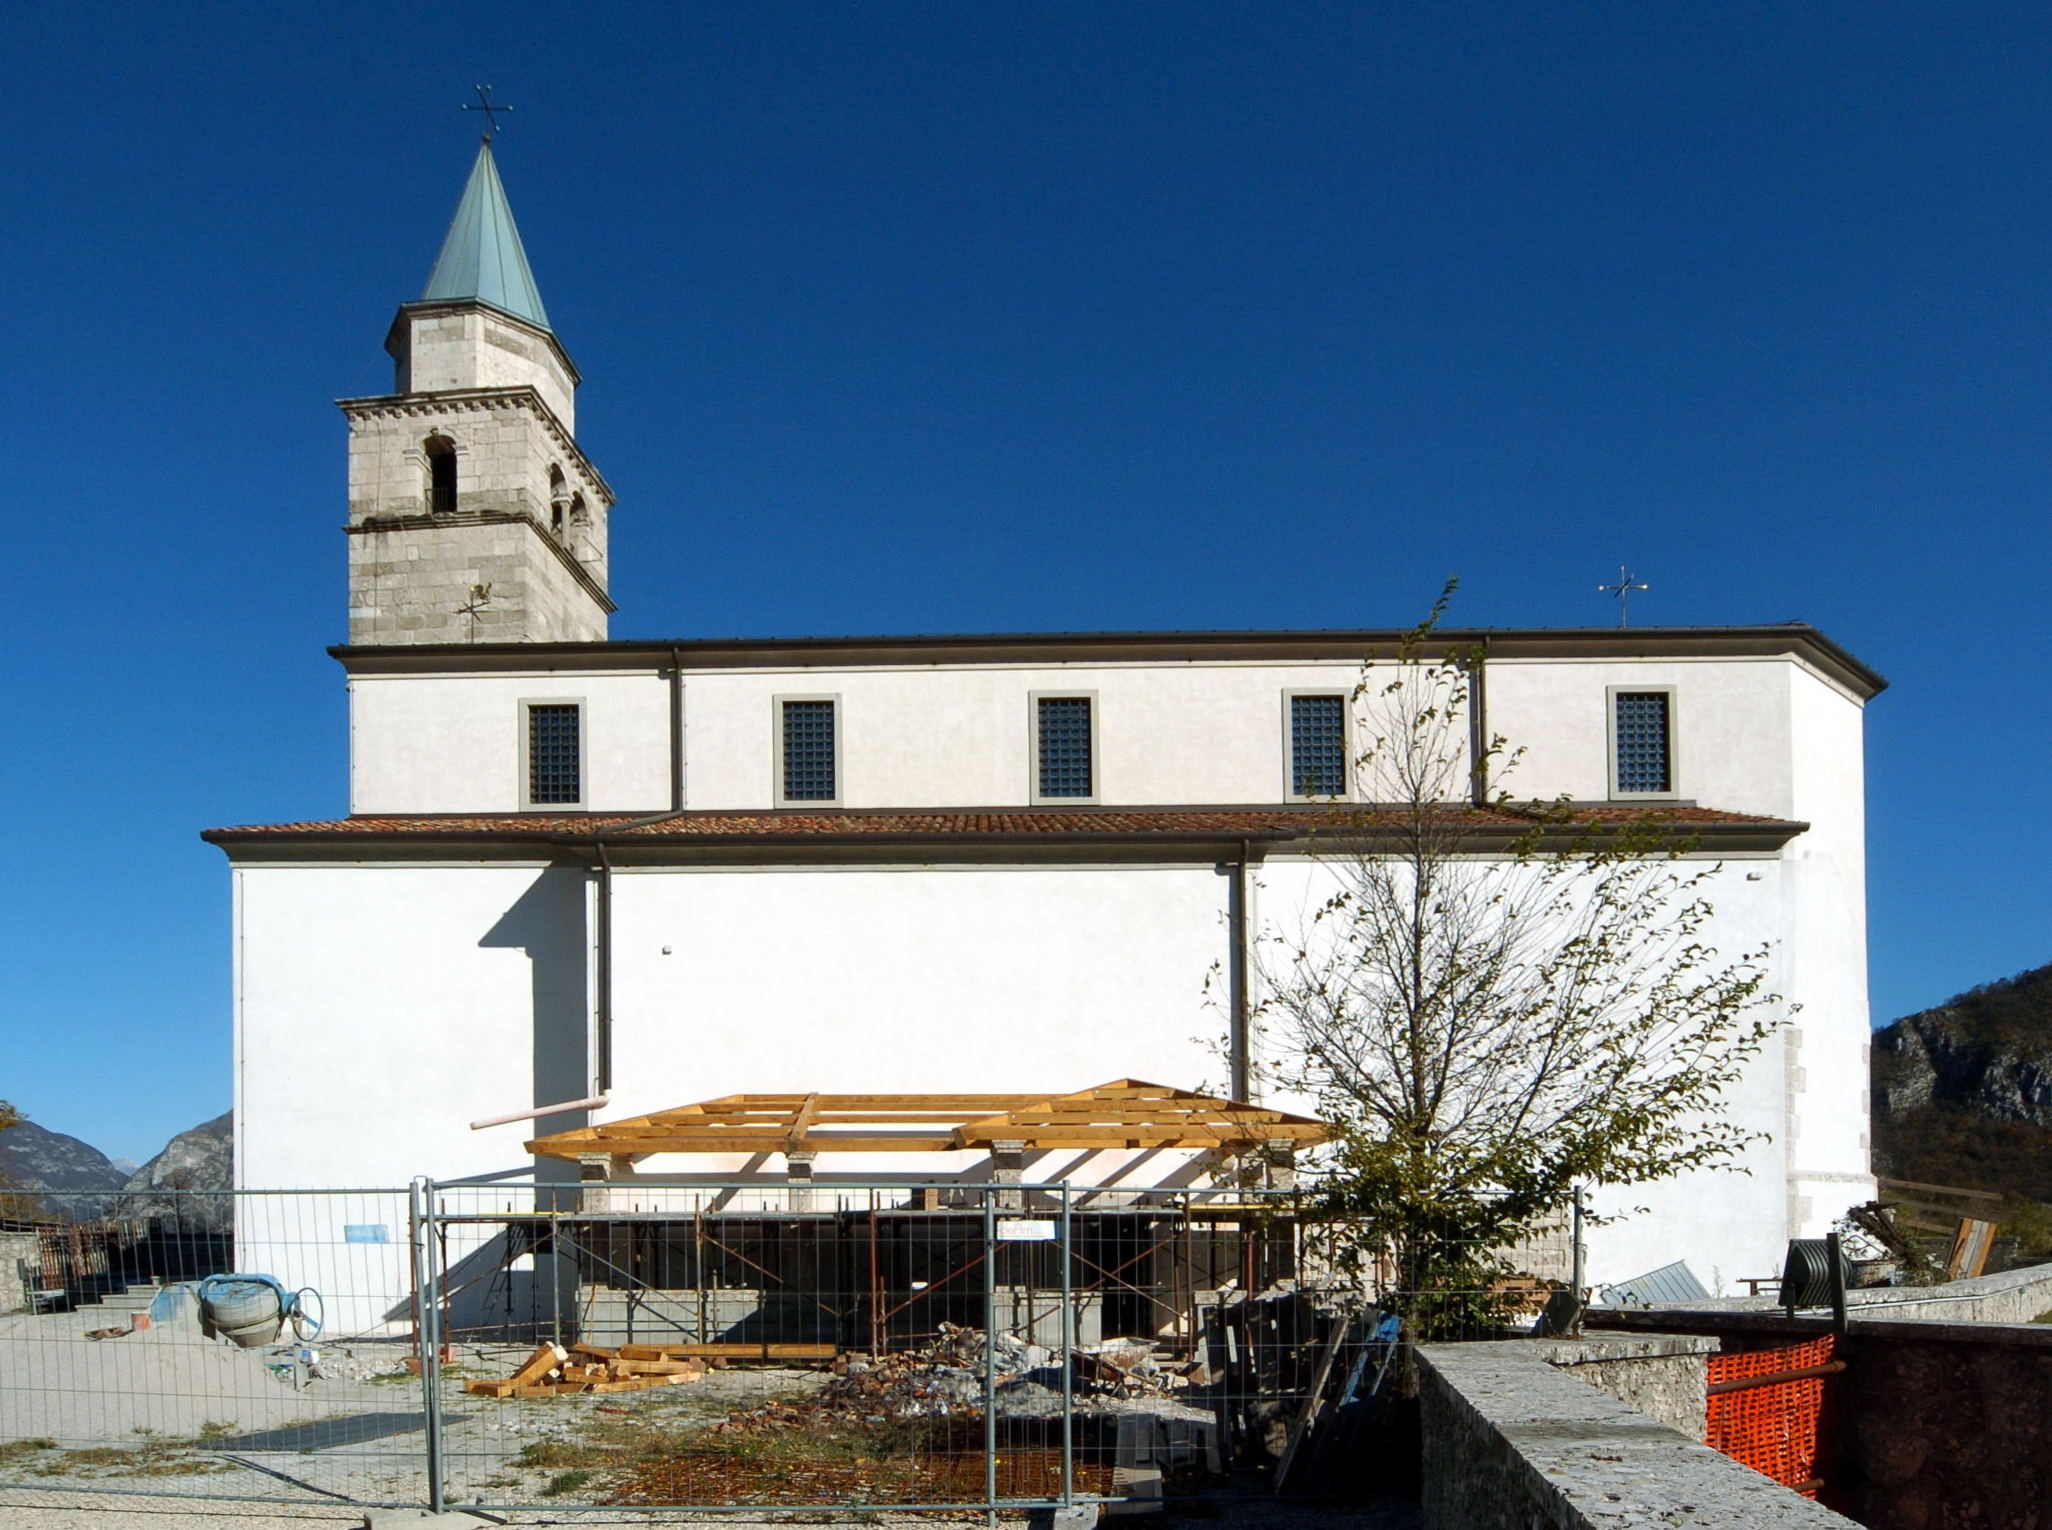 Pieve Santo Stefano Italy  city photos : Cavazzo Càrnico Cesclans Pieve di Santo Stefano 01112007 61 ...